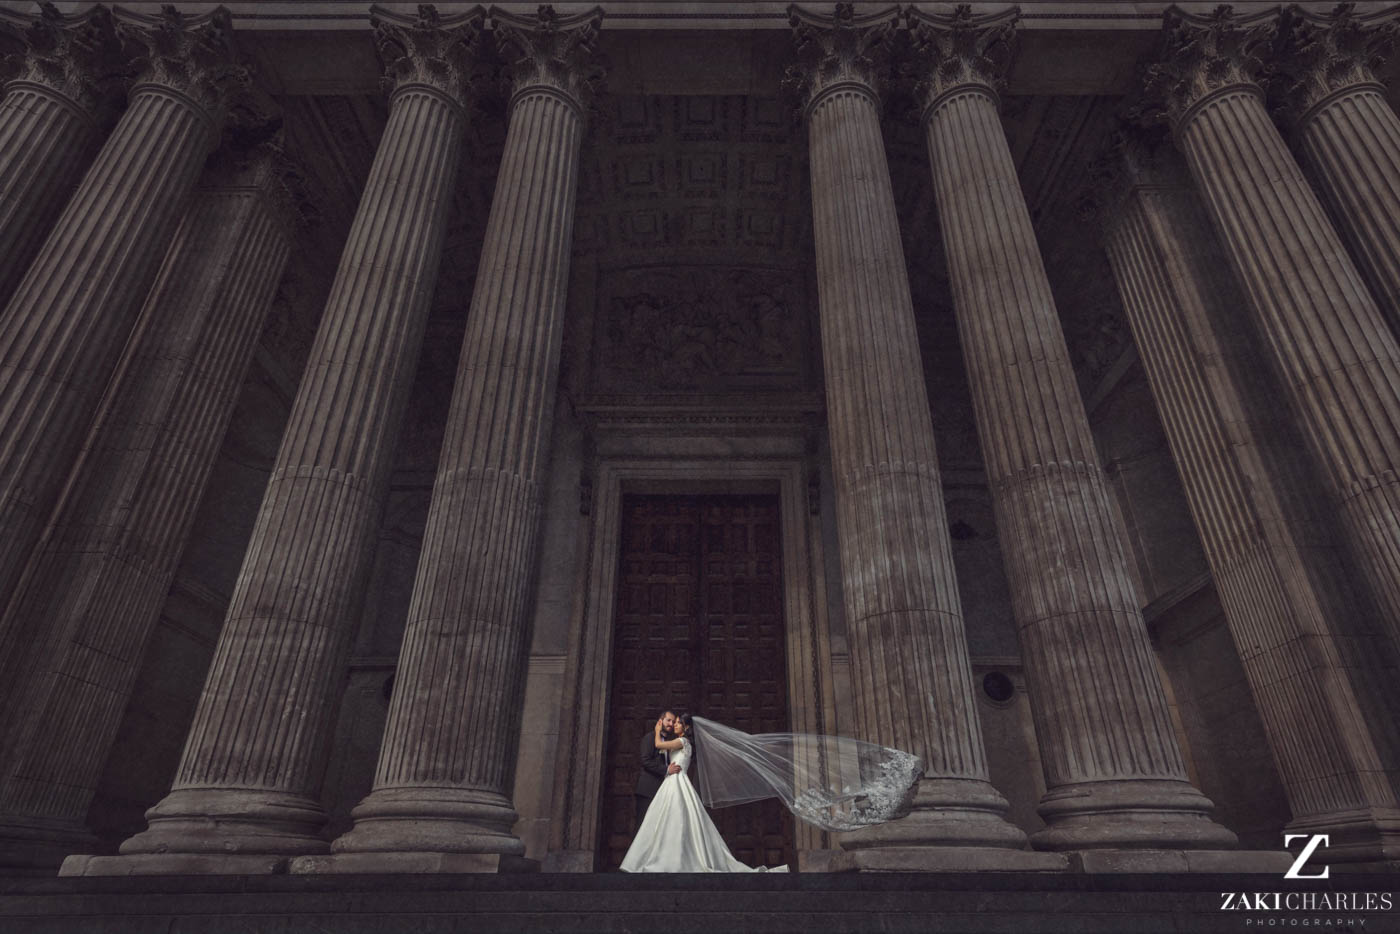 Fine art wedding photography at Marriott Hotel Regents Park 1